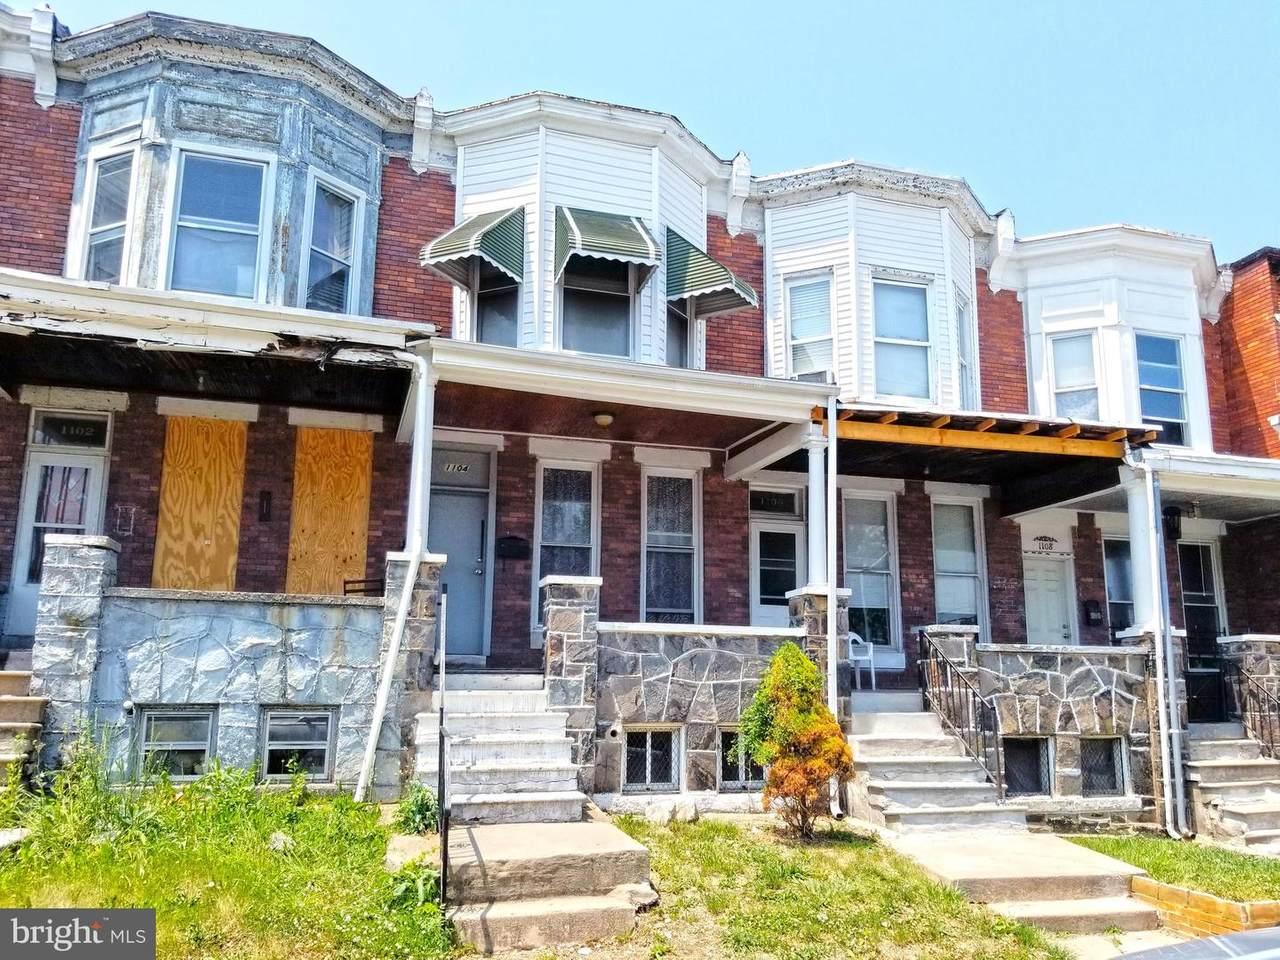 1104 Dukeland Street - Photo 1